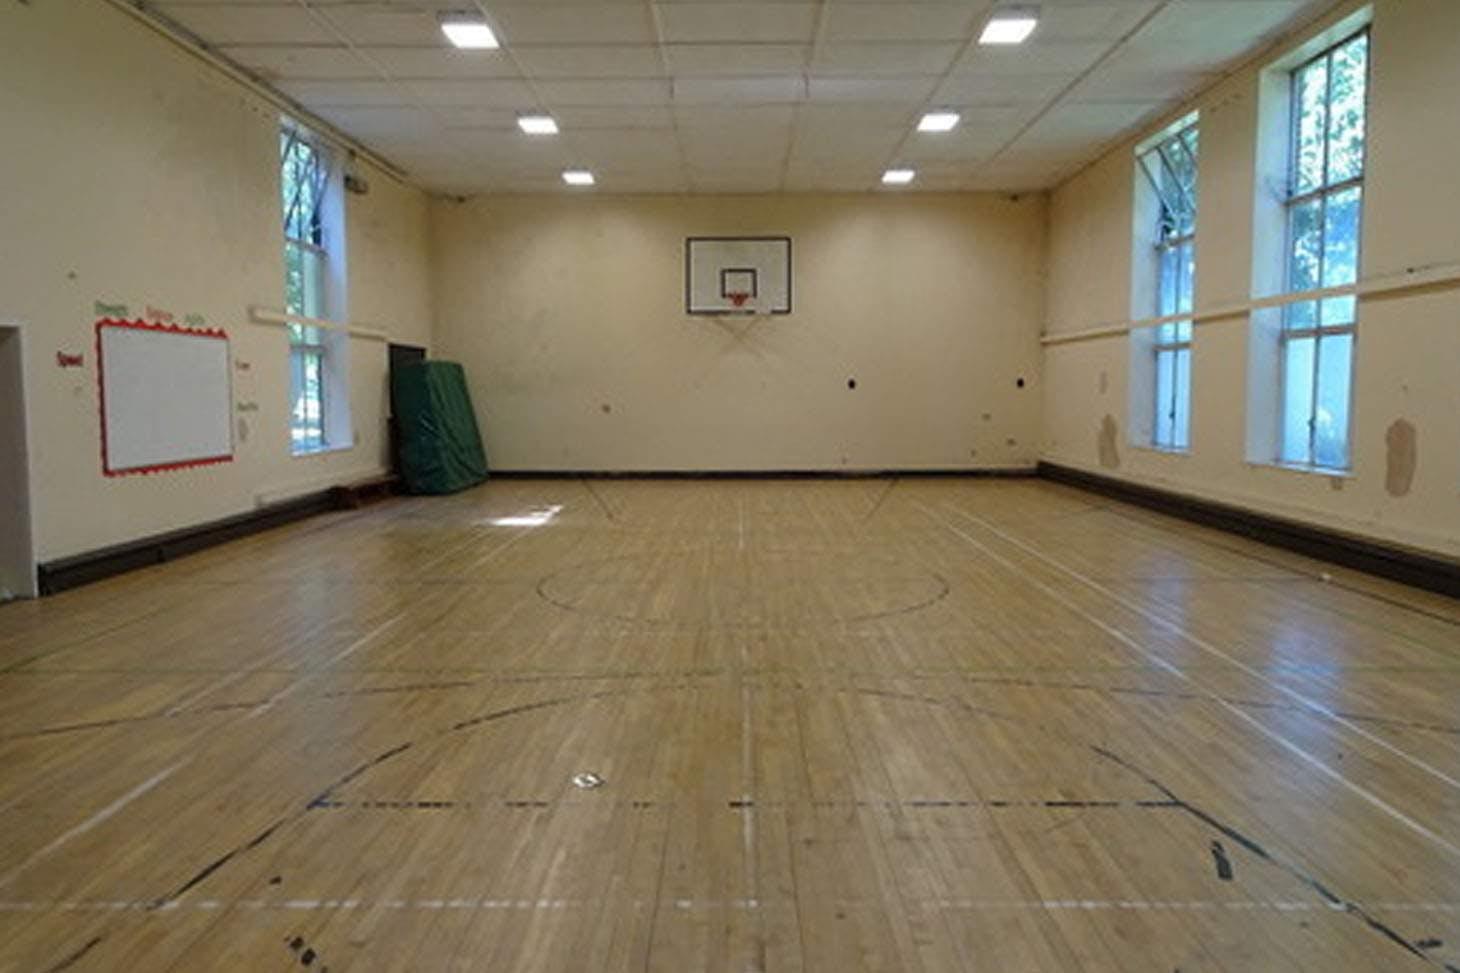 Tudor Grange Academy Solihull Gymnasium space hire